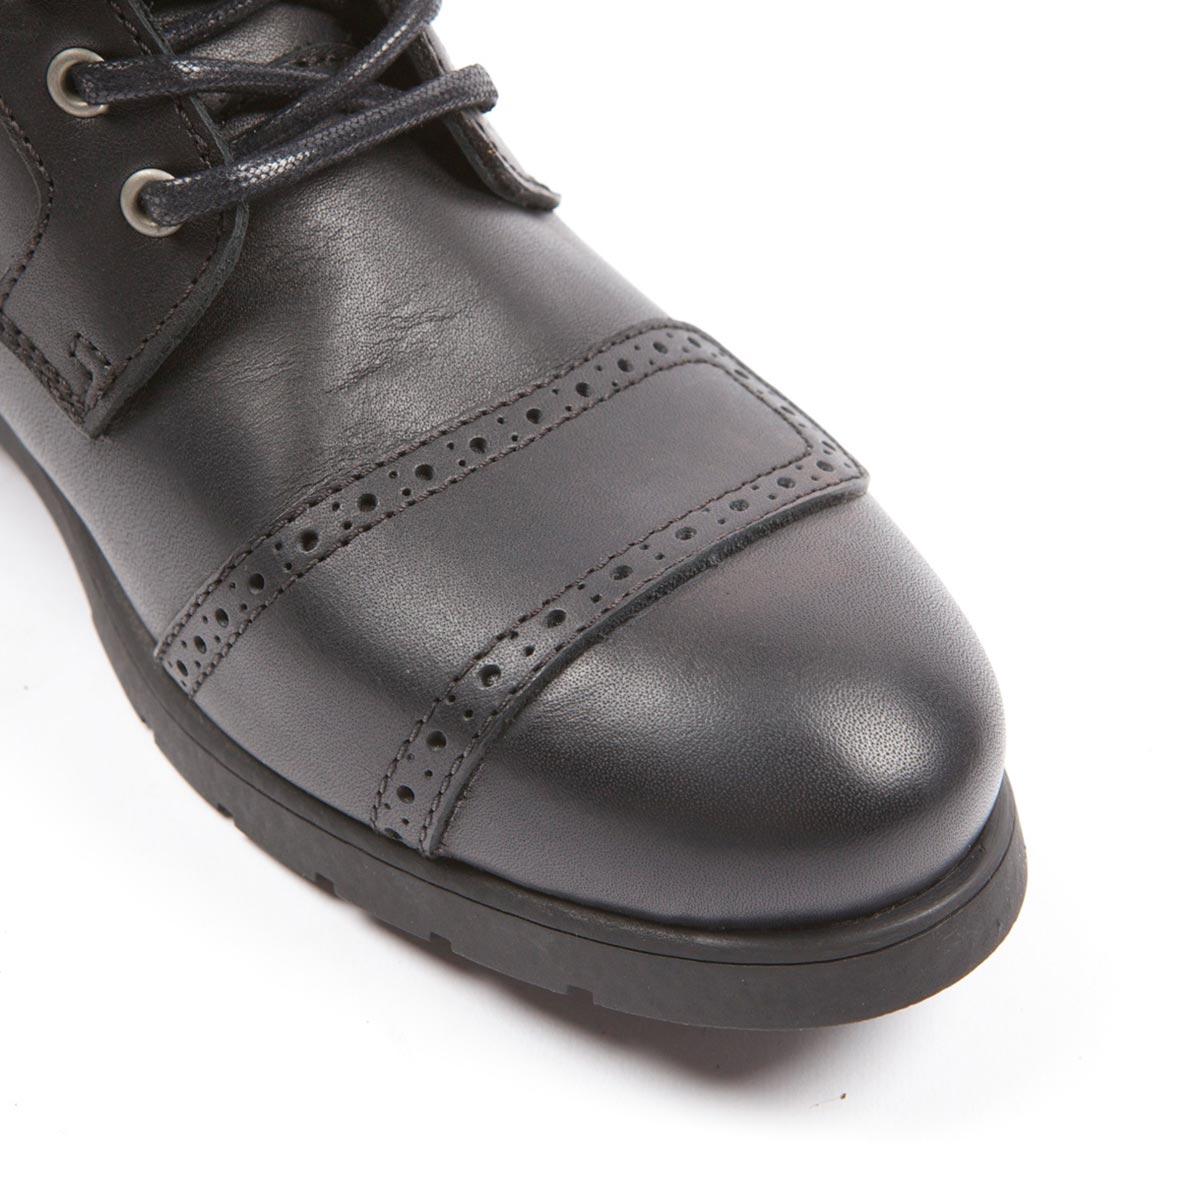 Helstons Travel Boots Black